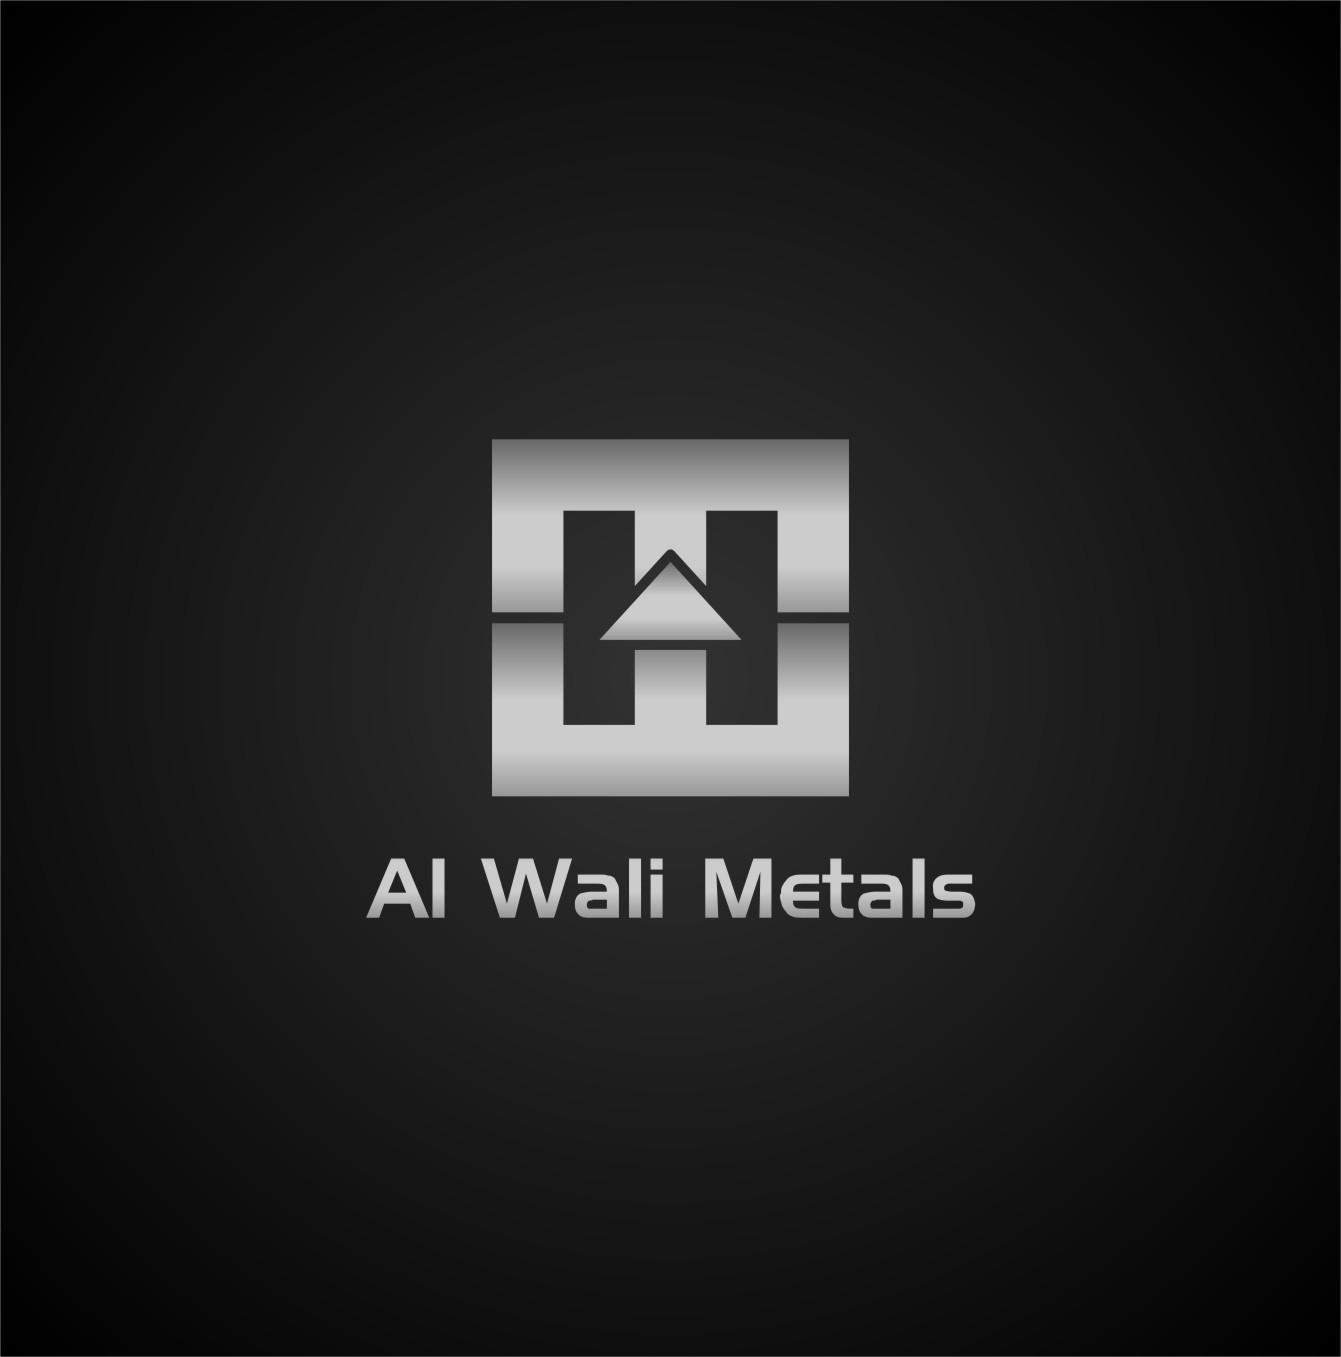 Logo Design by RasYa Muhammad Athaya - Entry No. 142 in the Logo Design Contest Inspiring Logo Design for Al Wali Metals.